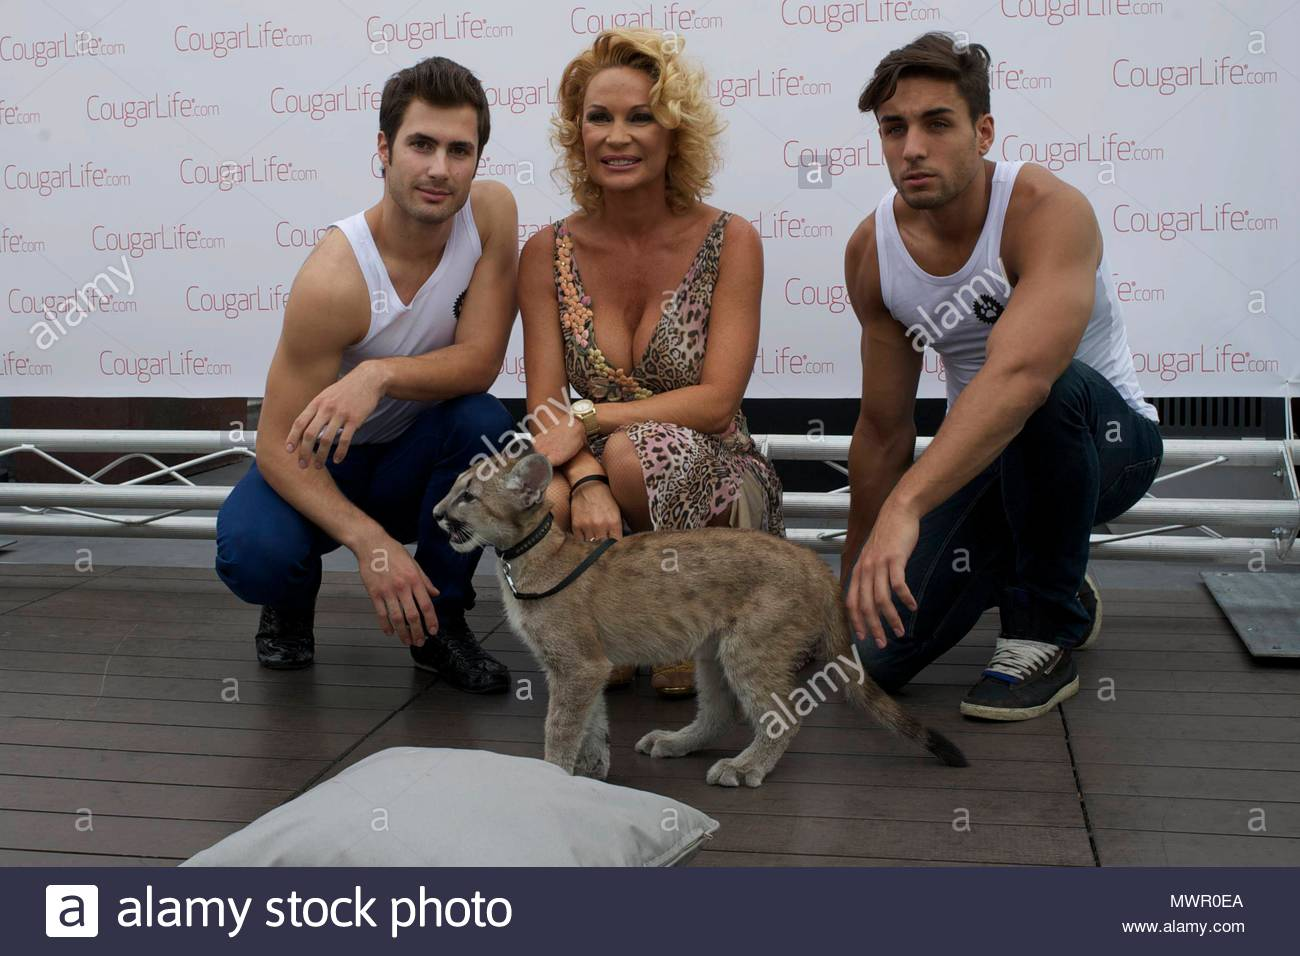 Cougar life dating